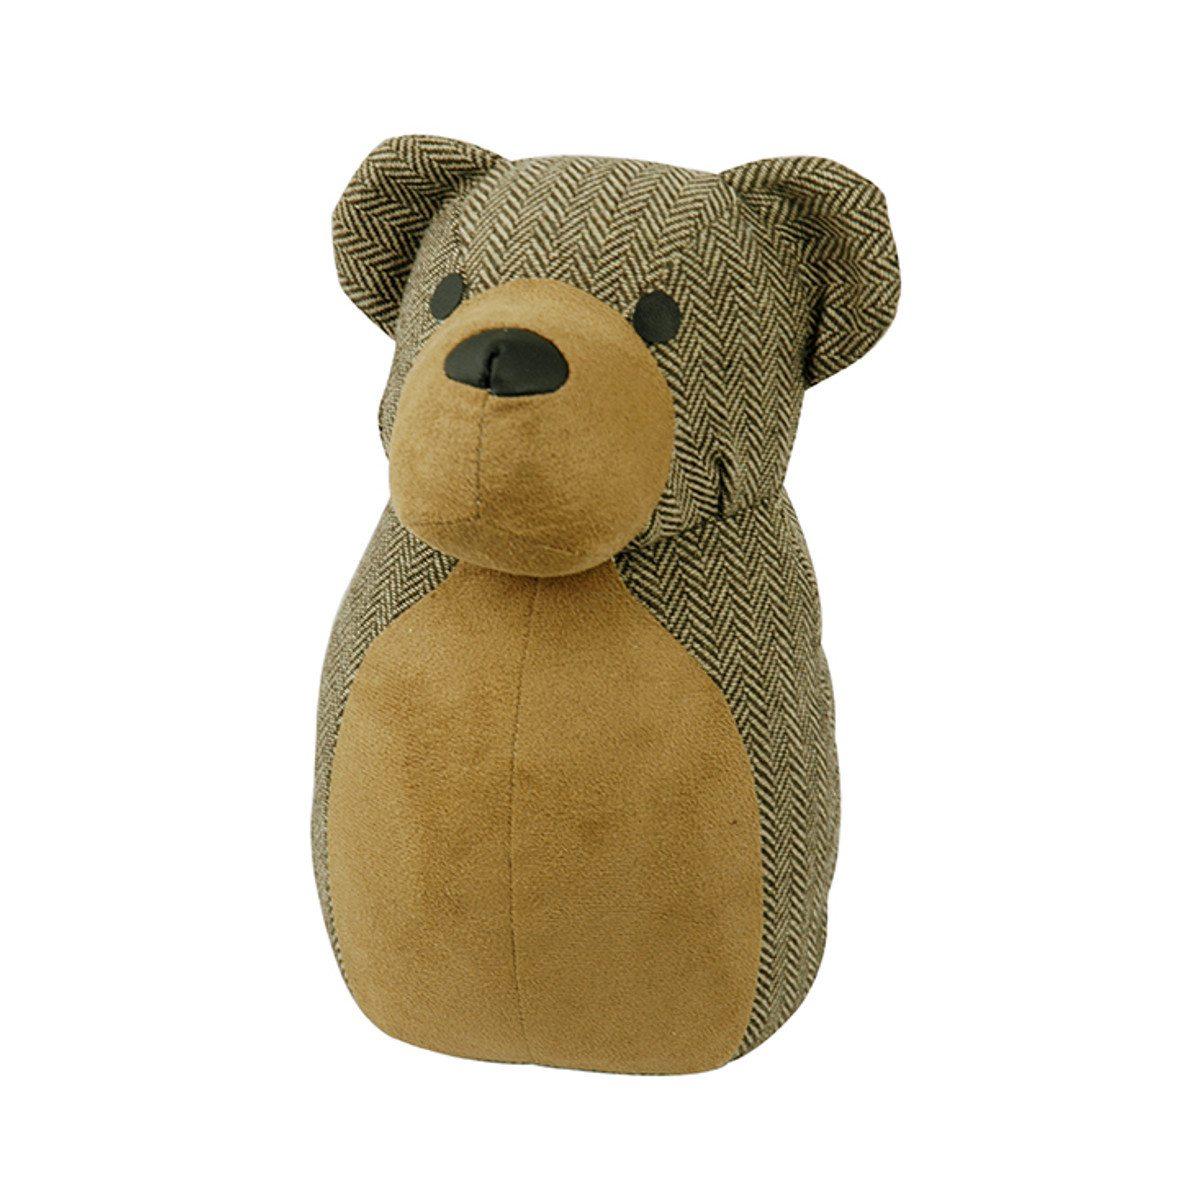 Tierisch guter Türstopper Bär - Vollansicht